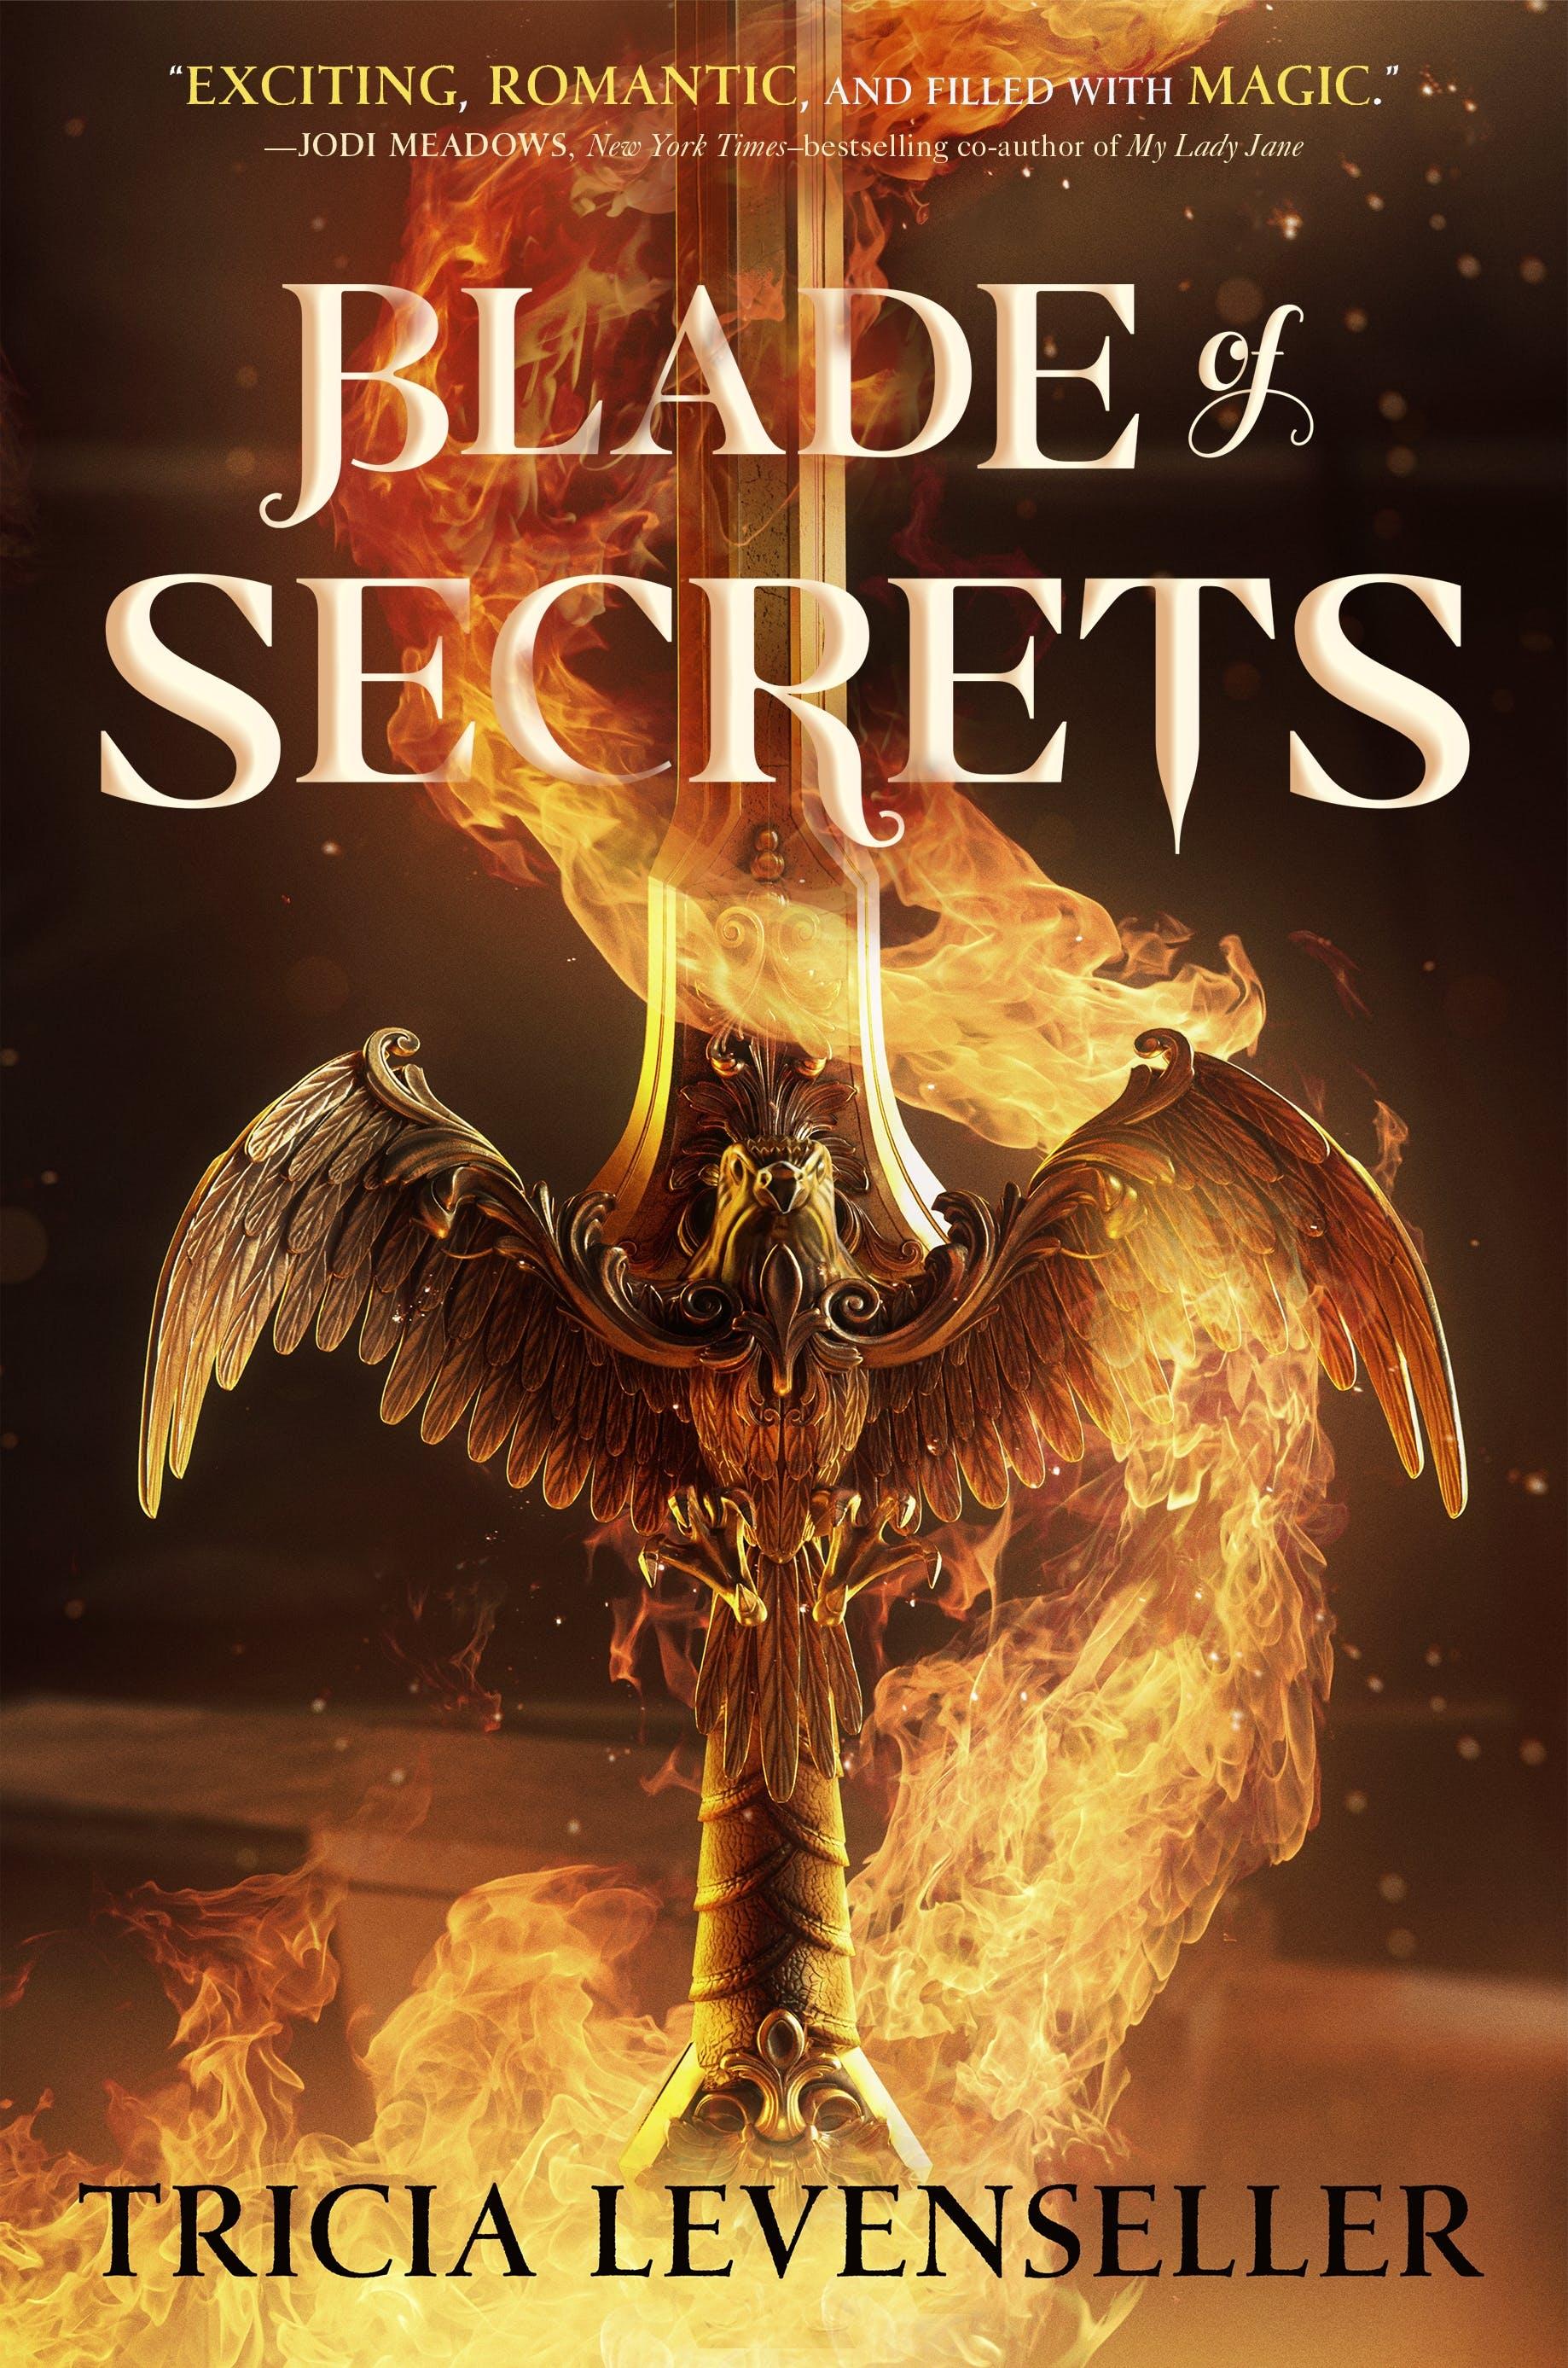 Image of Blade of Secrets